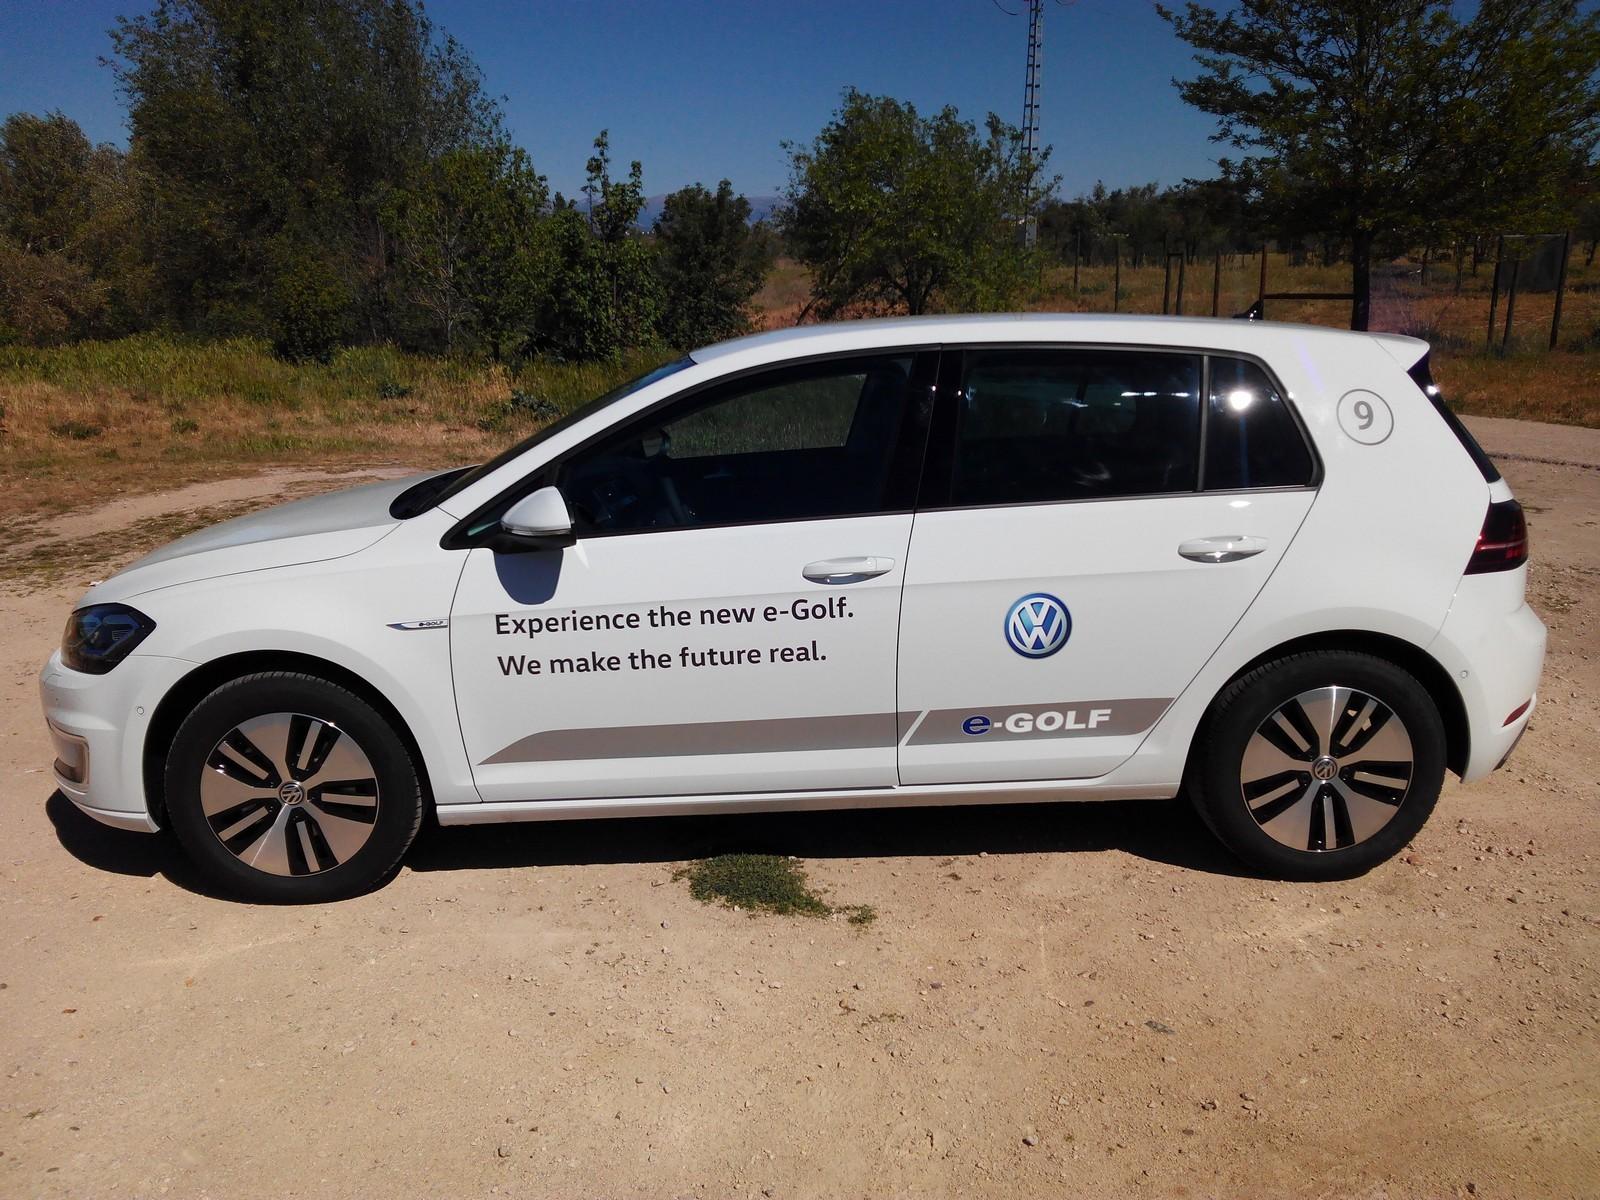 Foto de Volkswagen e-Golf (23/23)